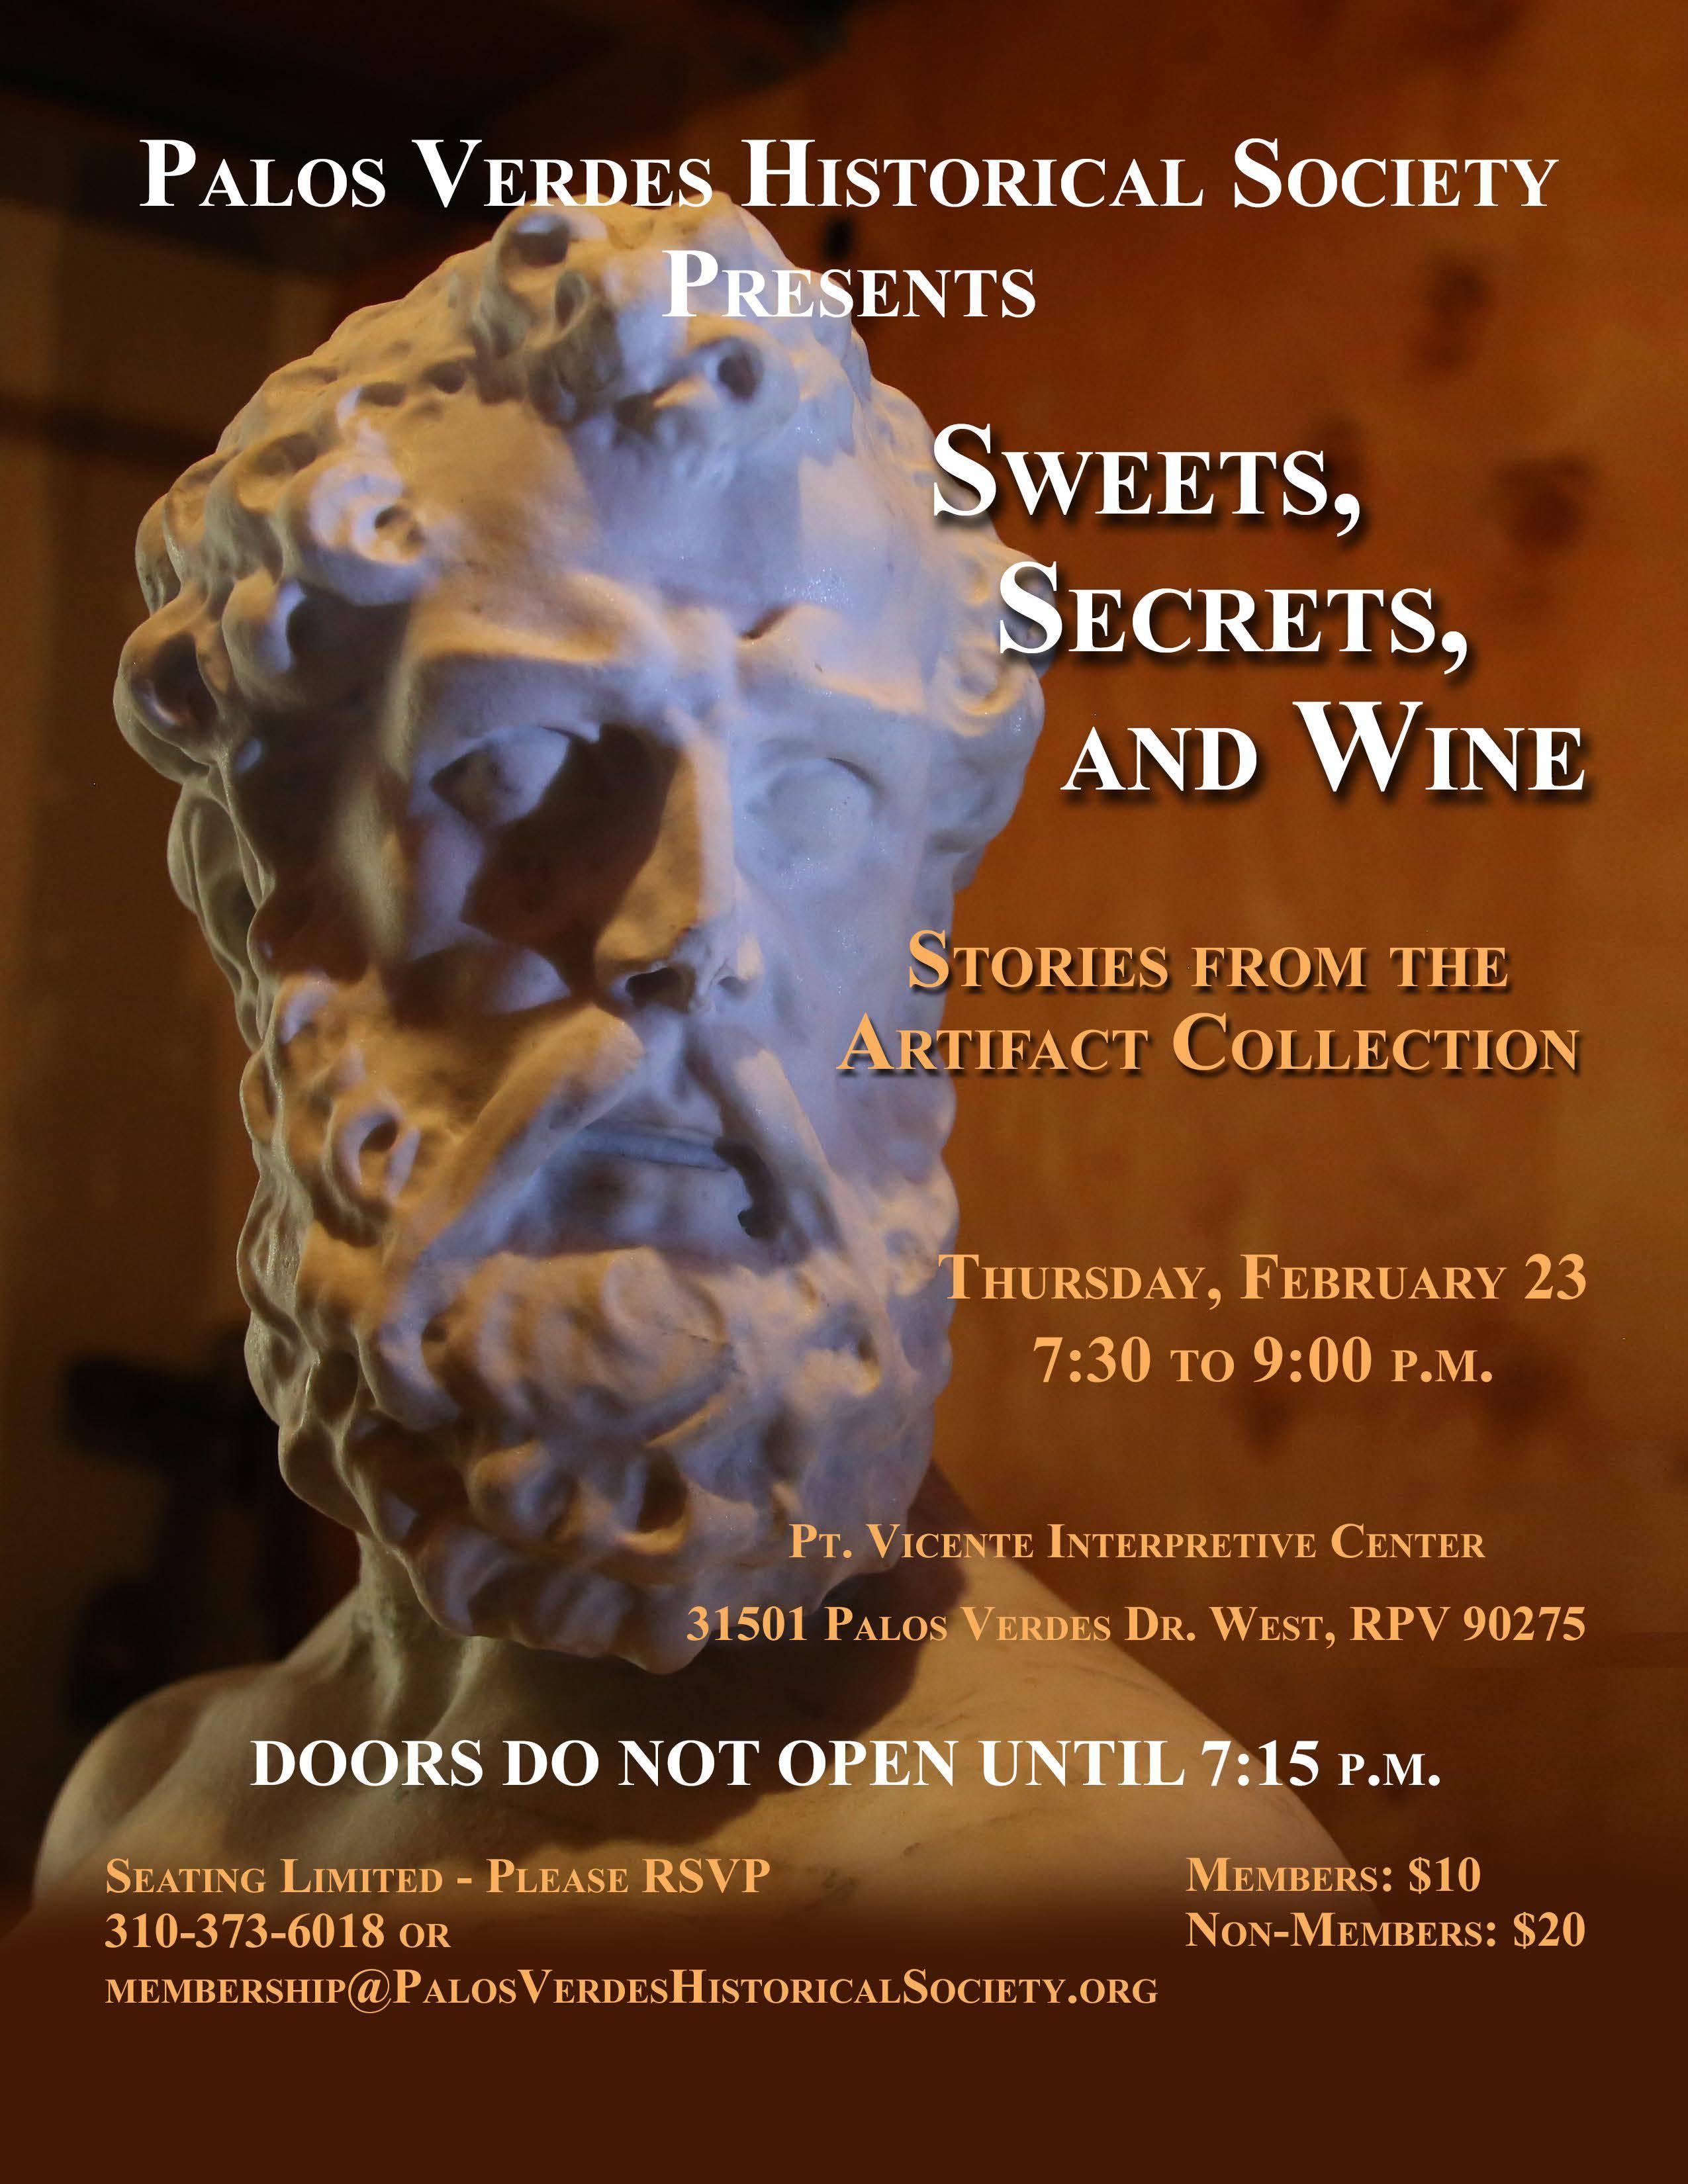 Palos Verdes Historical Society Presents Sweets, Secrets, and Wine @ Pt. Vincente Interpretive Center | Rancho Palos Verdes | California | United States